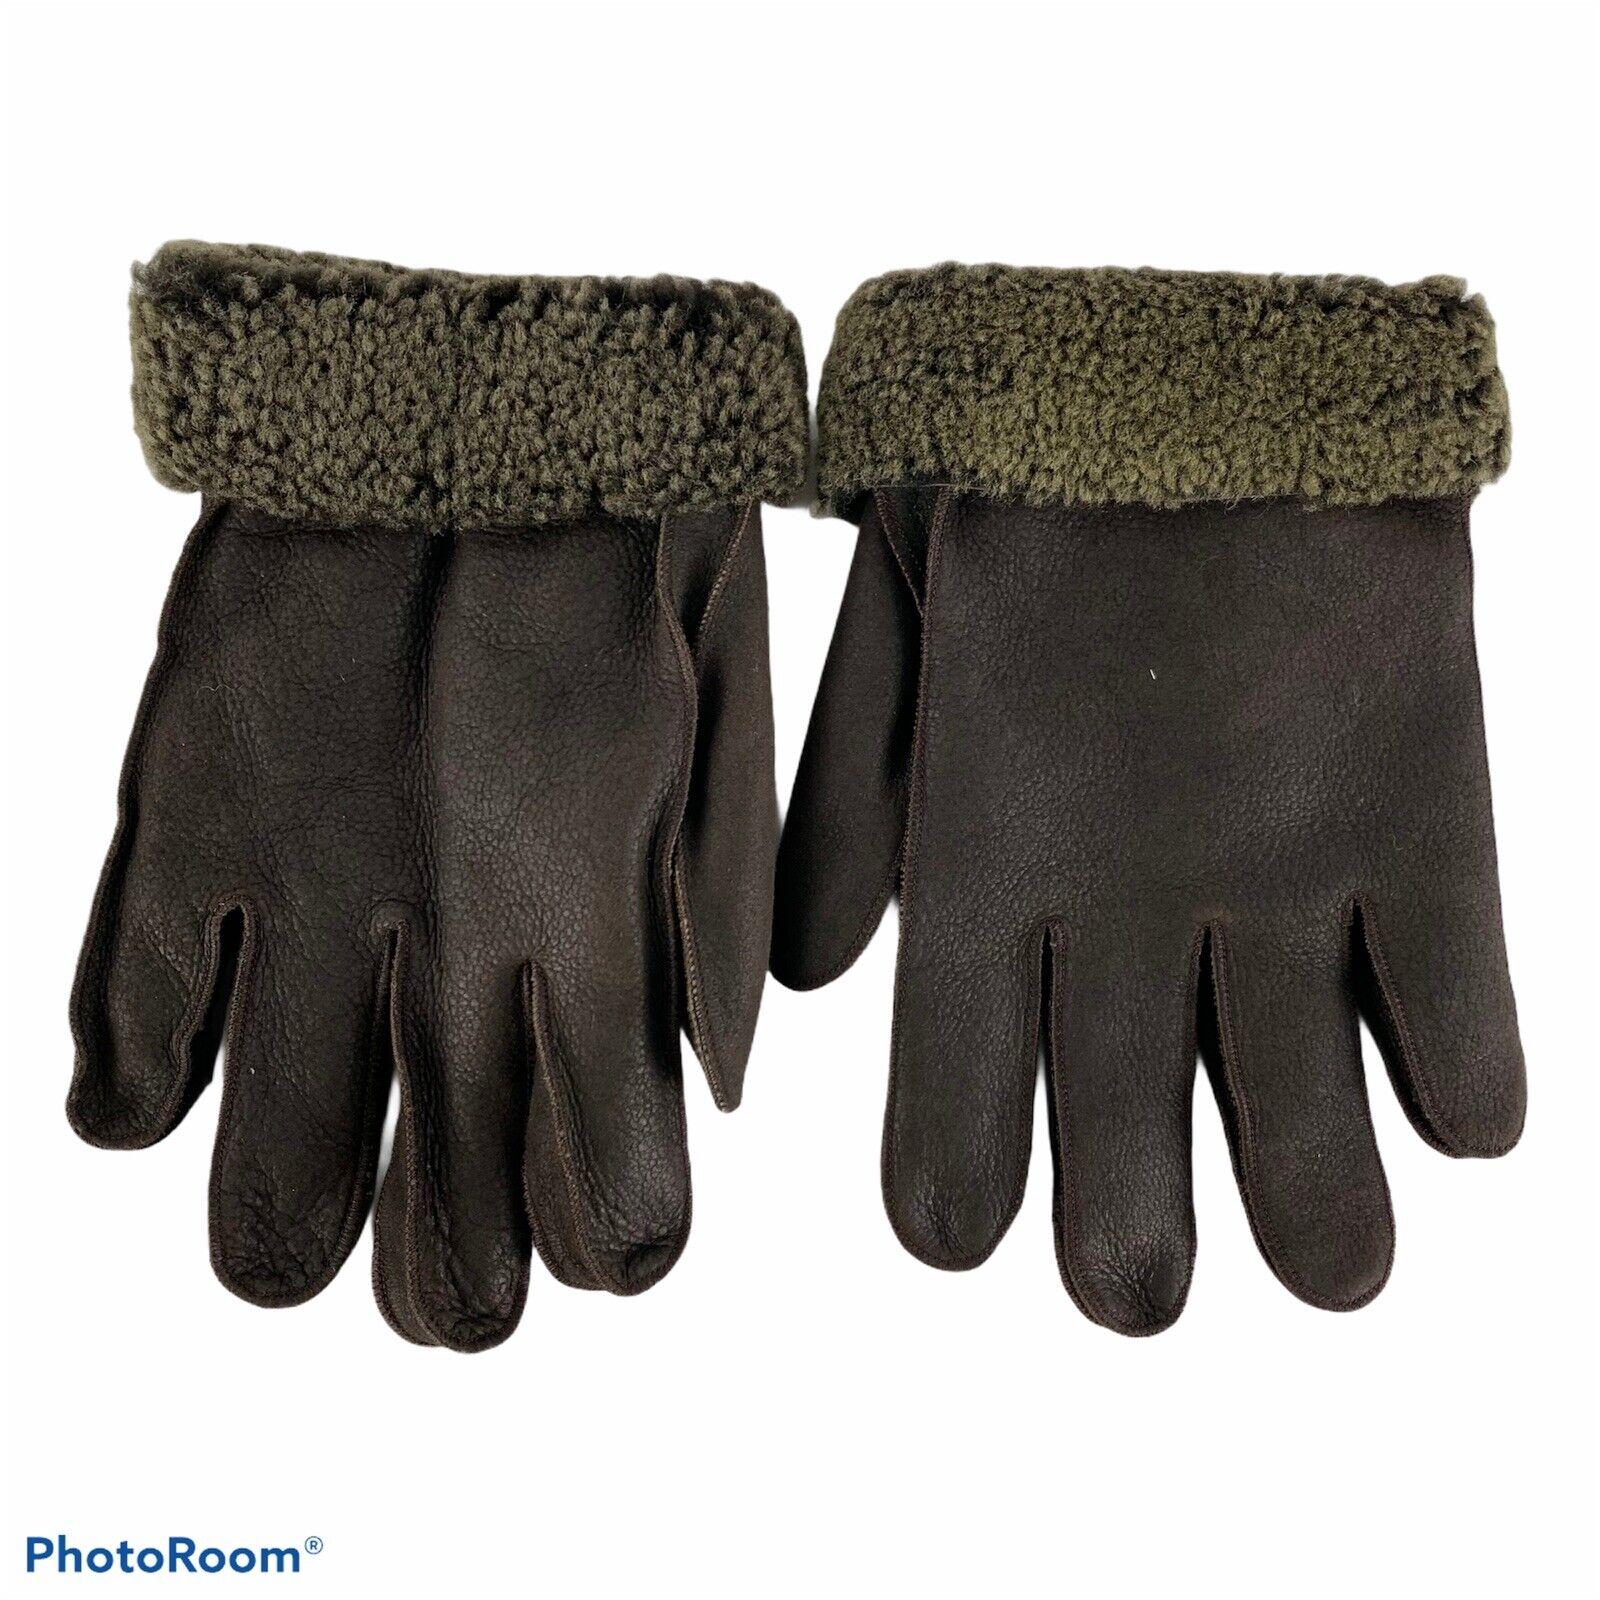 Aston Men's XL Gloves 100% Sherling Suede Brown Excellent Condition Unique